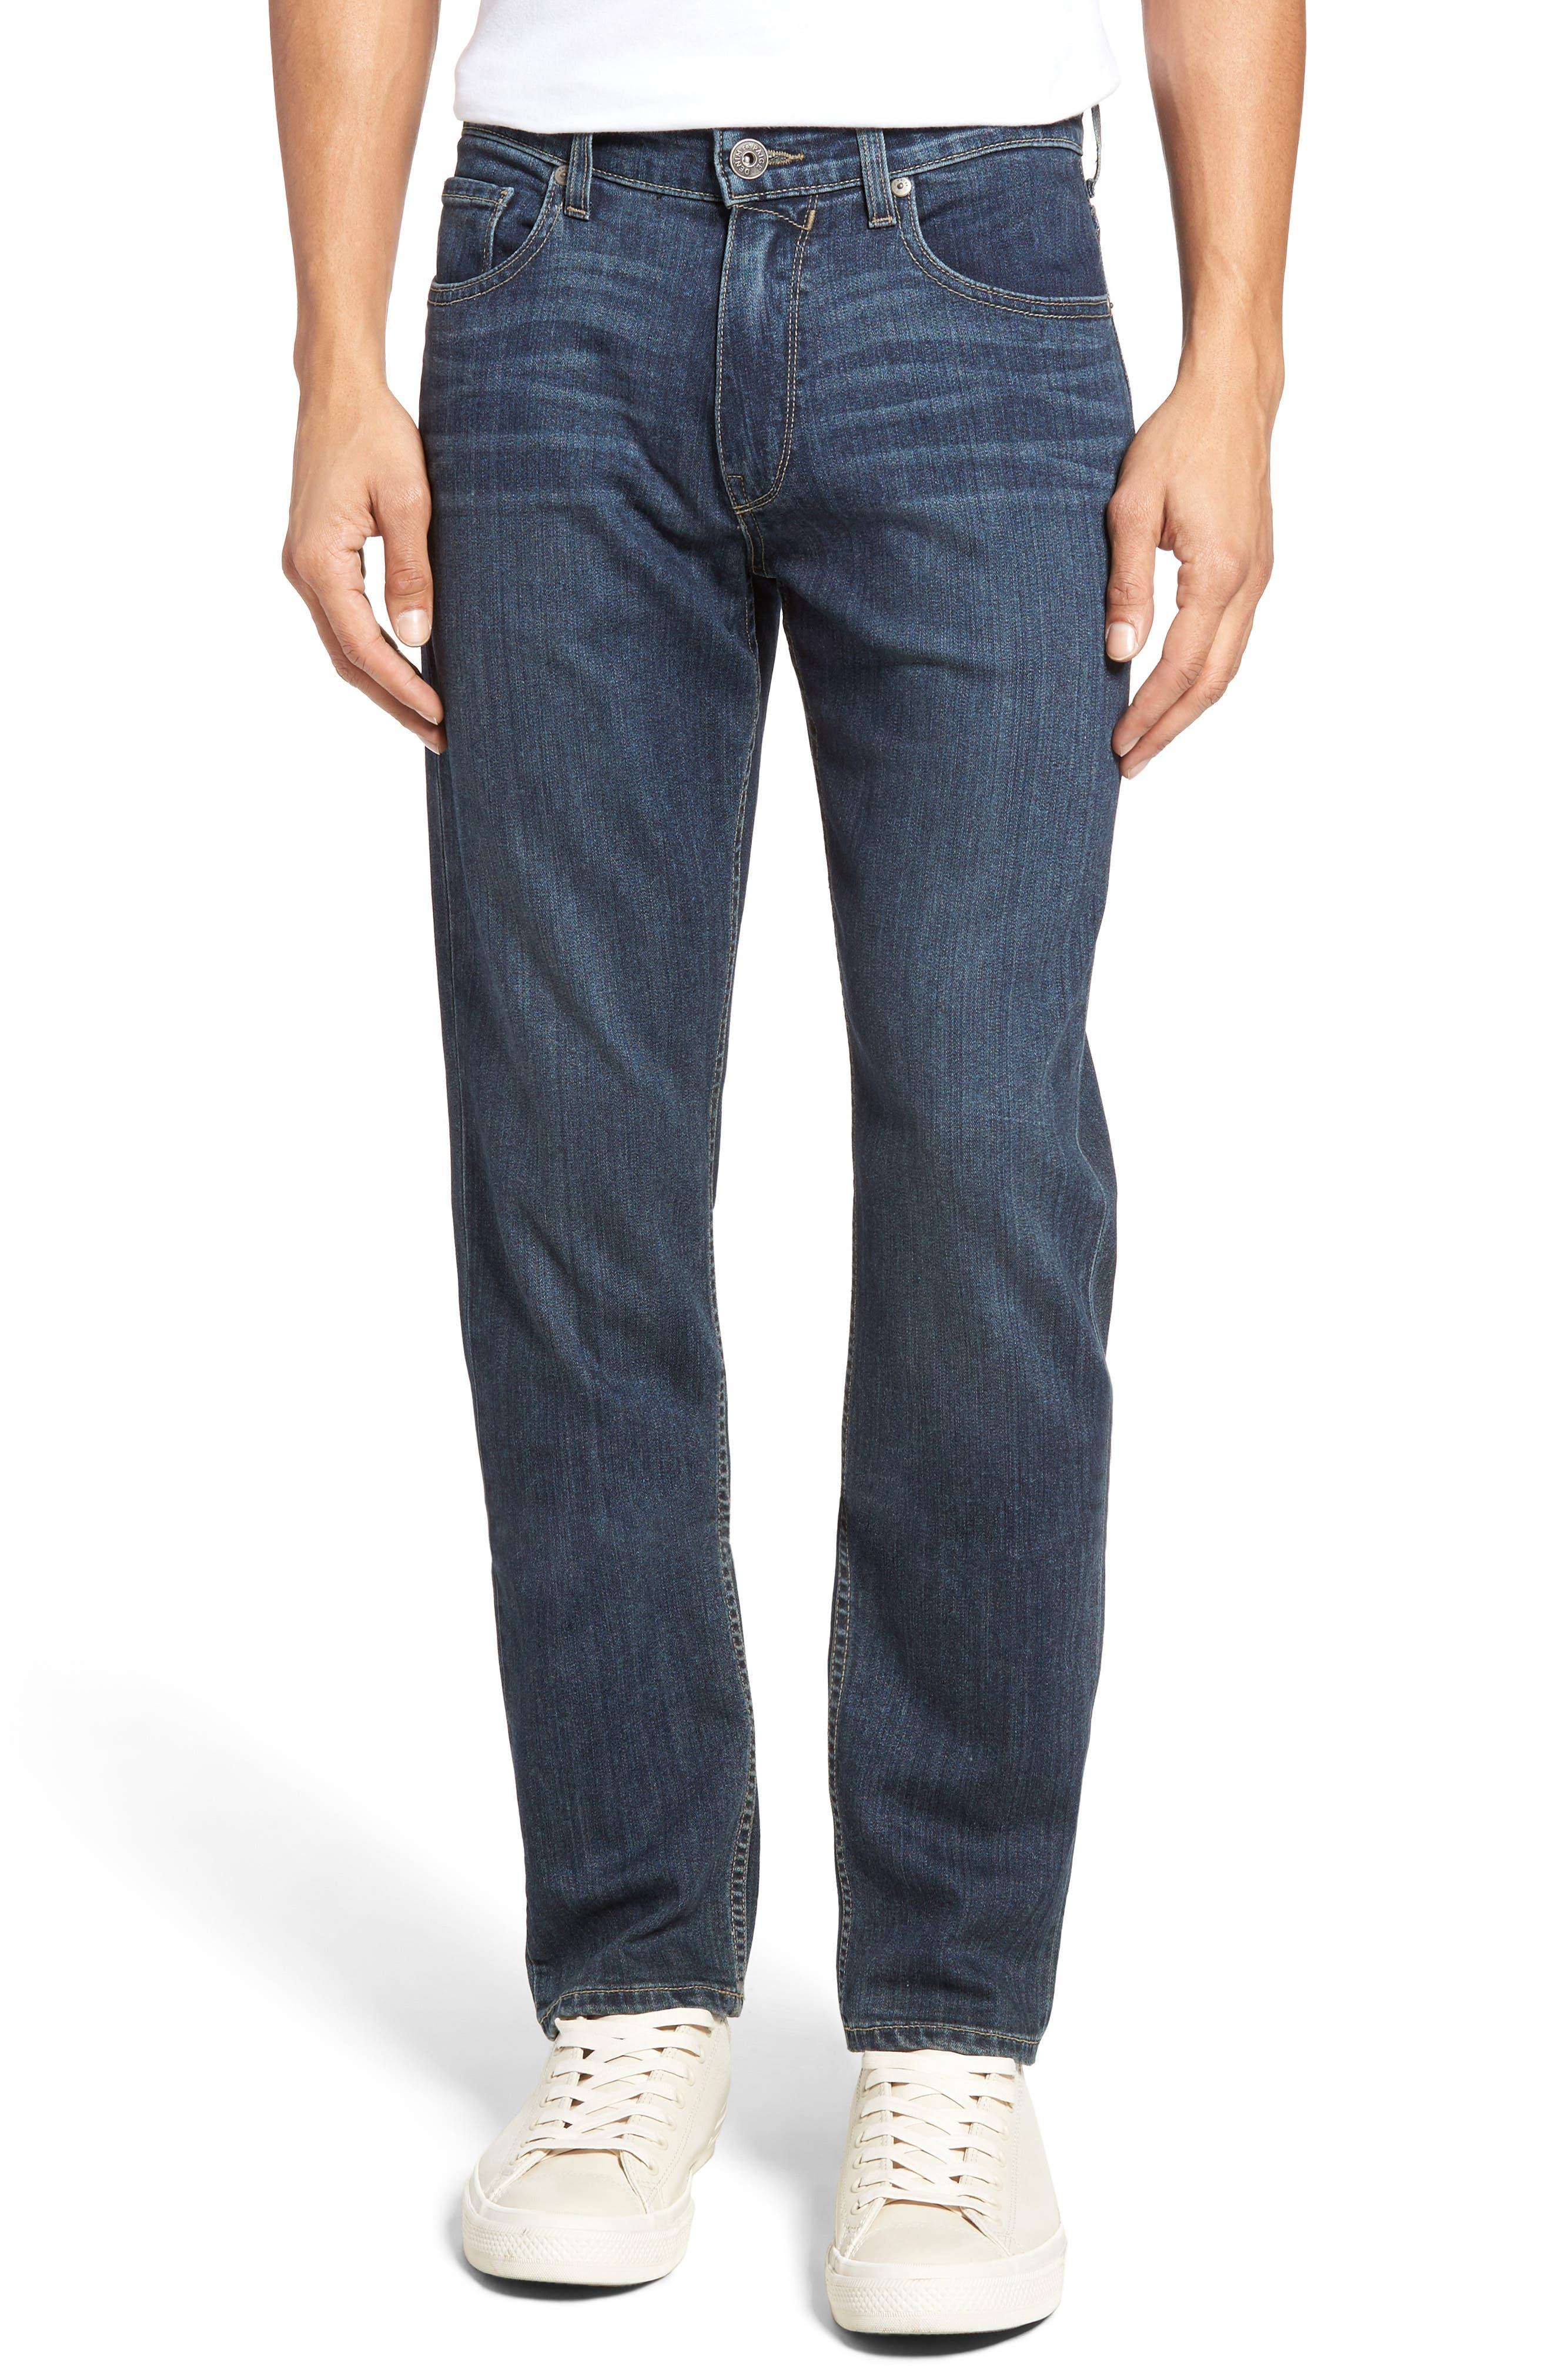 Alternate Image 1 Selected - PAIGE Transcend - Federal Slim Straight Leg Jeans (Wayne)